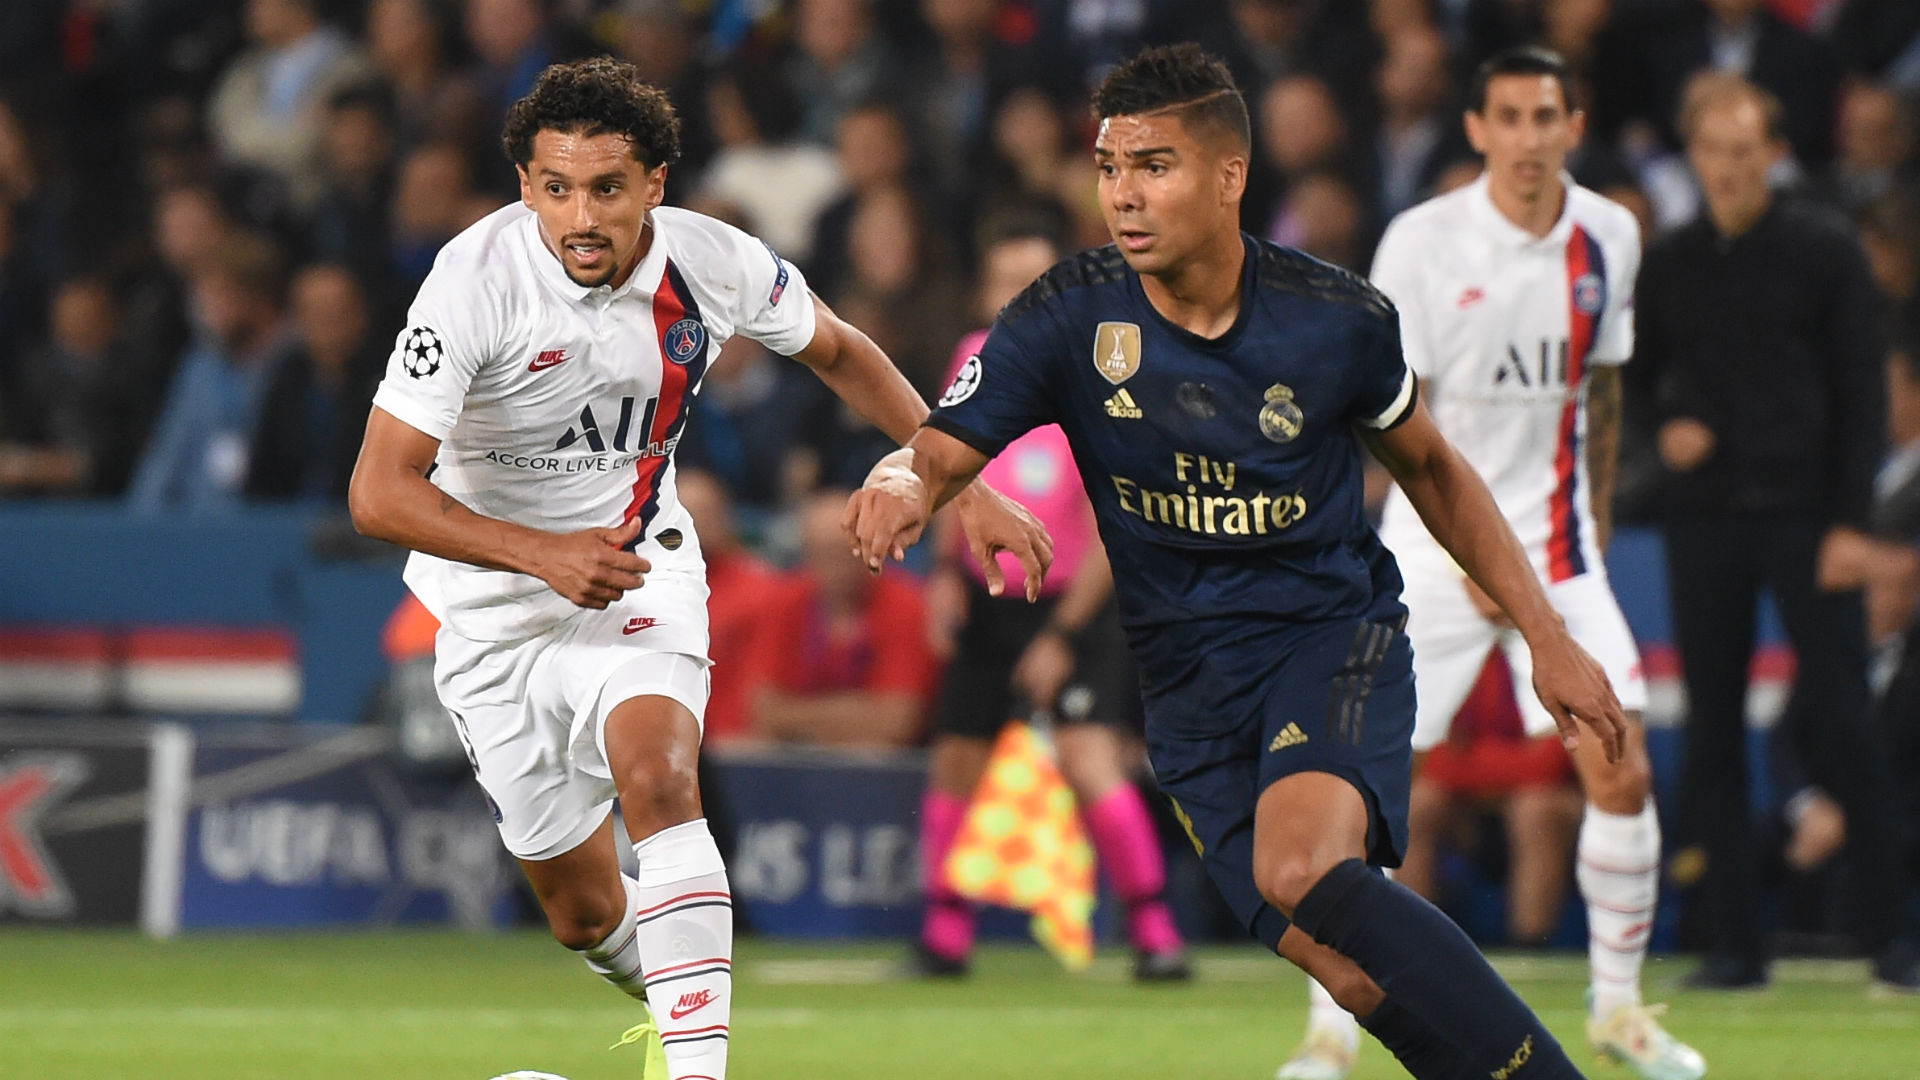 Marquinhos Casemiro Real Madrid PSG Champions League 2019